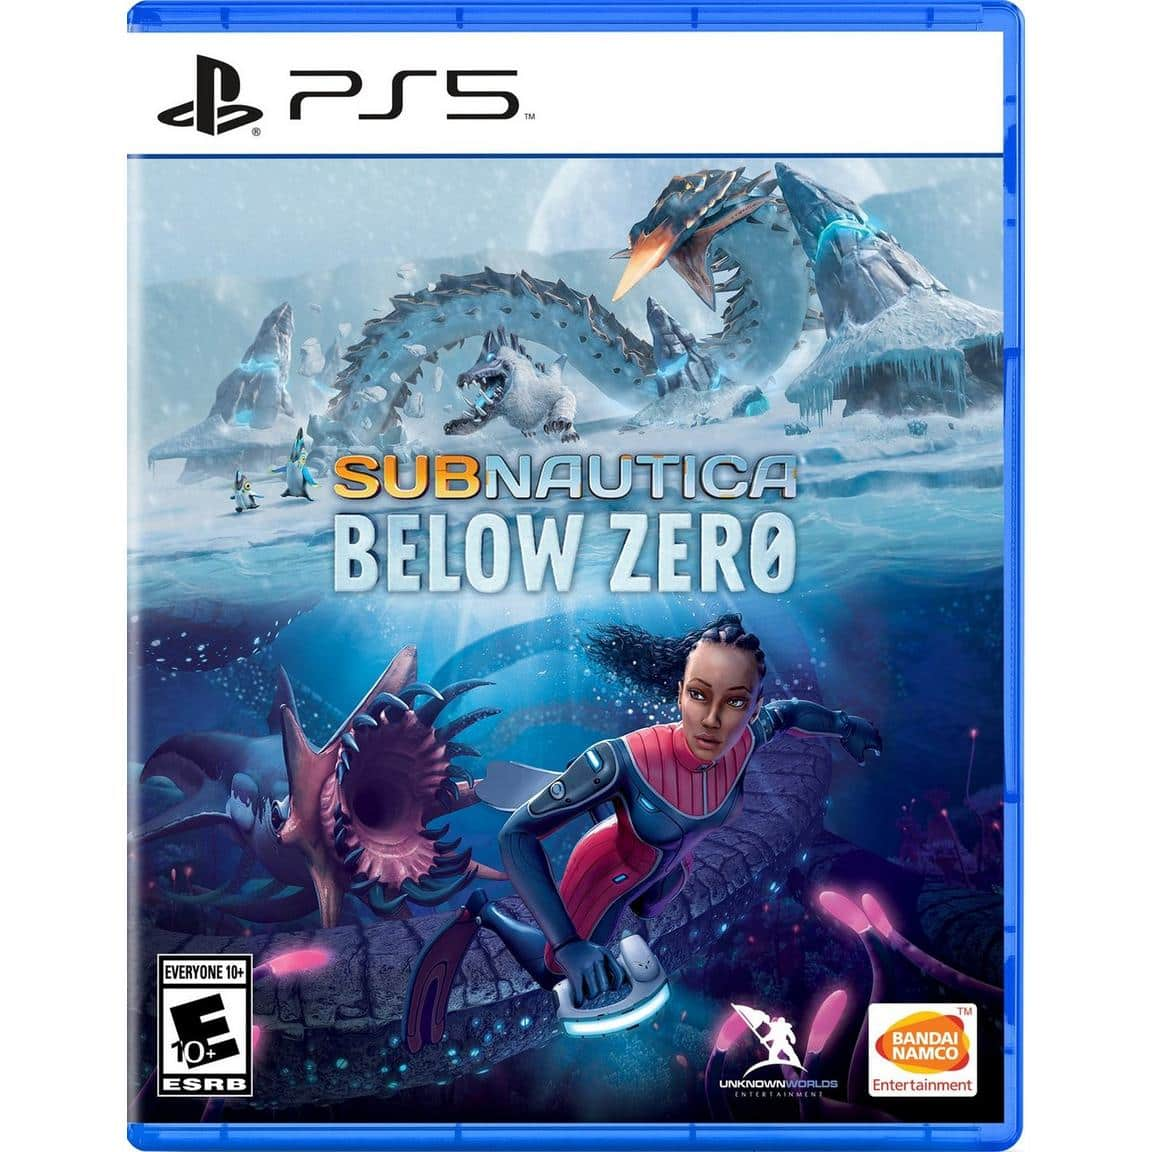 Subnautica: Below Zero (PS5, PS4, or Xbox One/Series X) $19.99 via GameStop